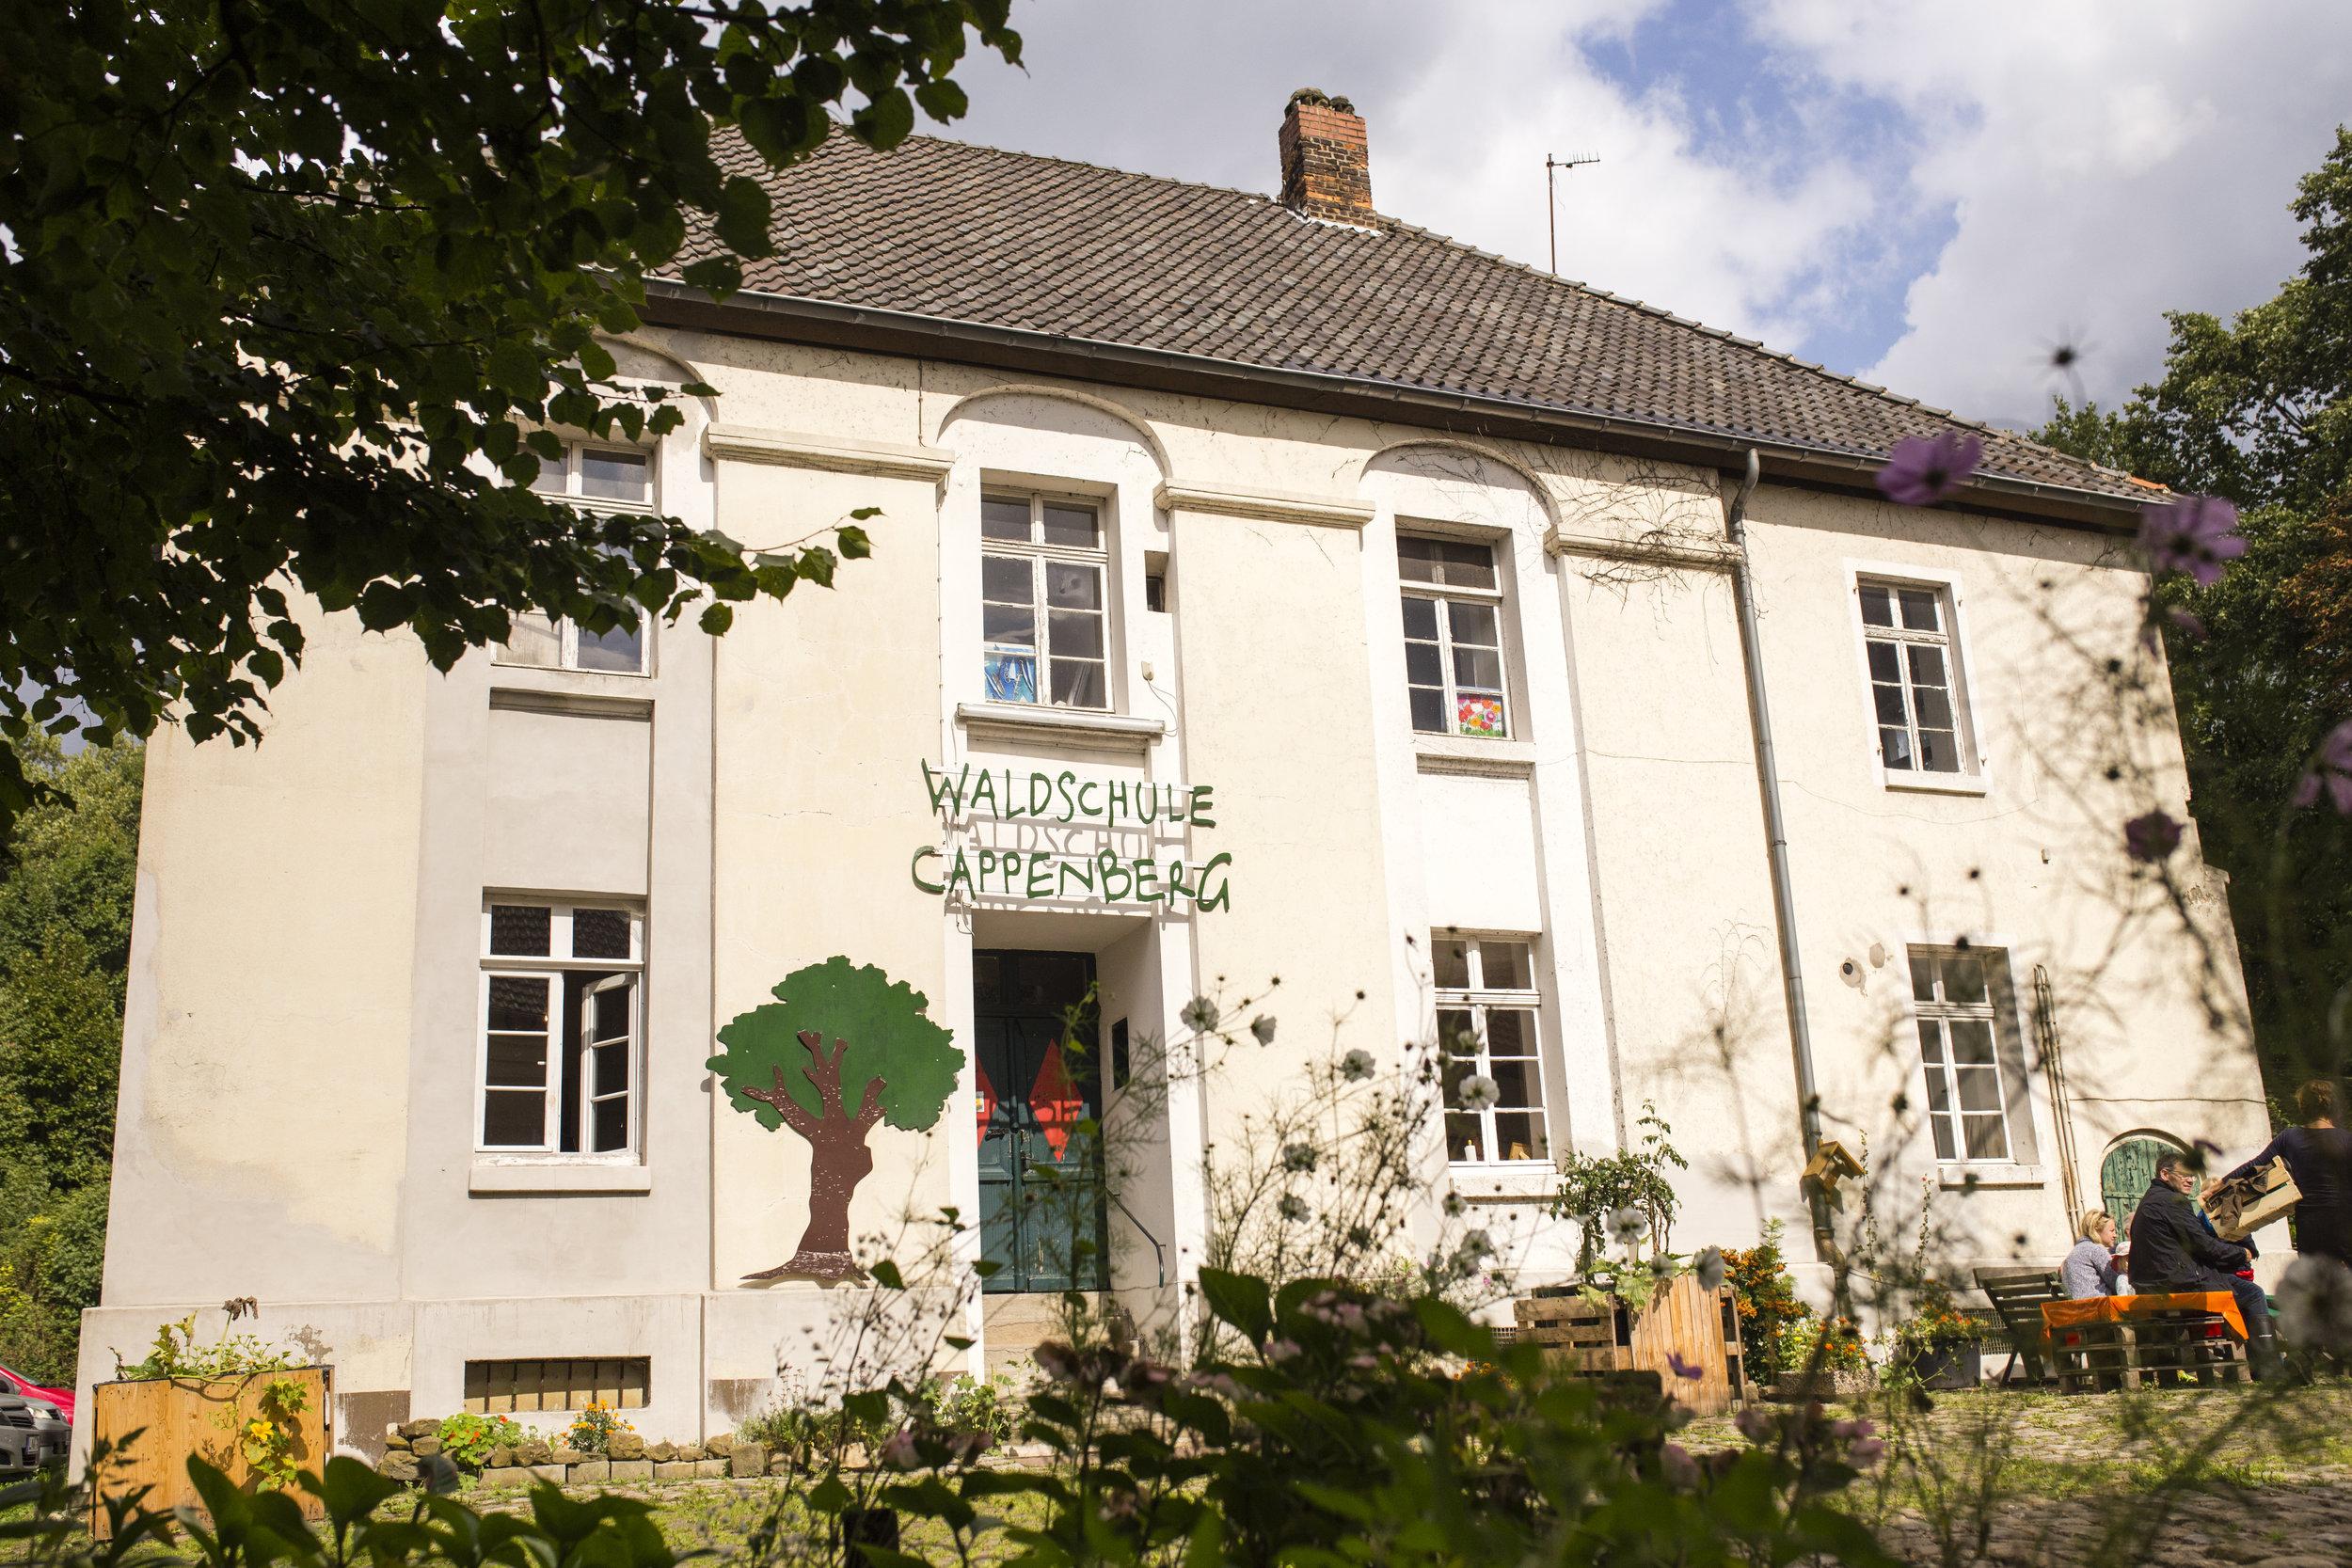 wir-in-der-region-fotoreportage-waldschule-cappenberg-5729.jpg